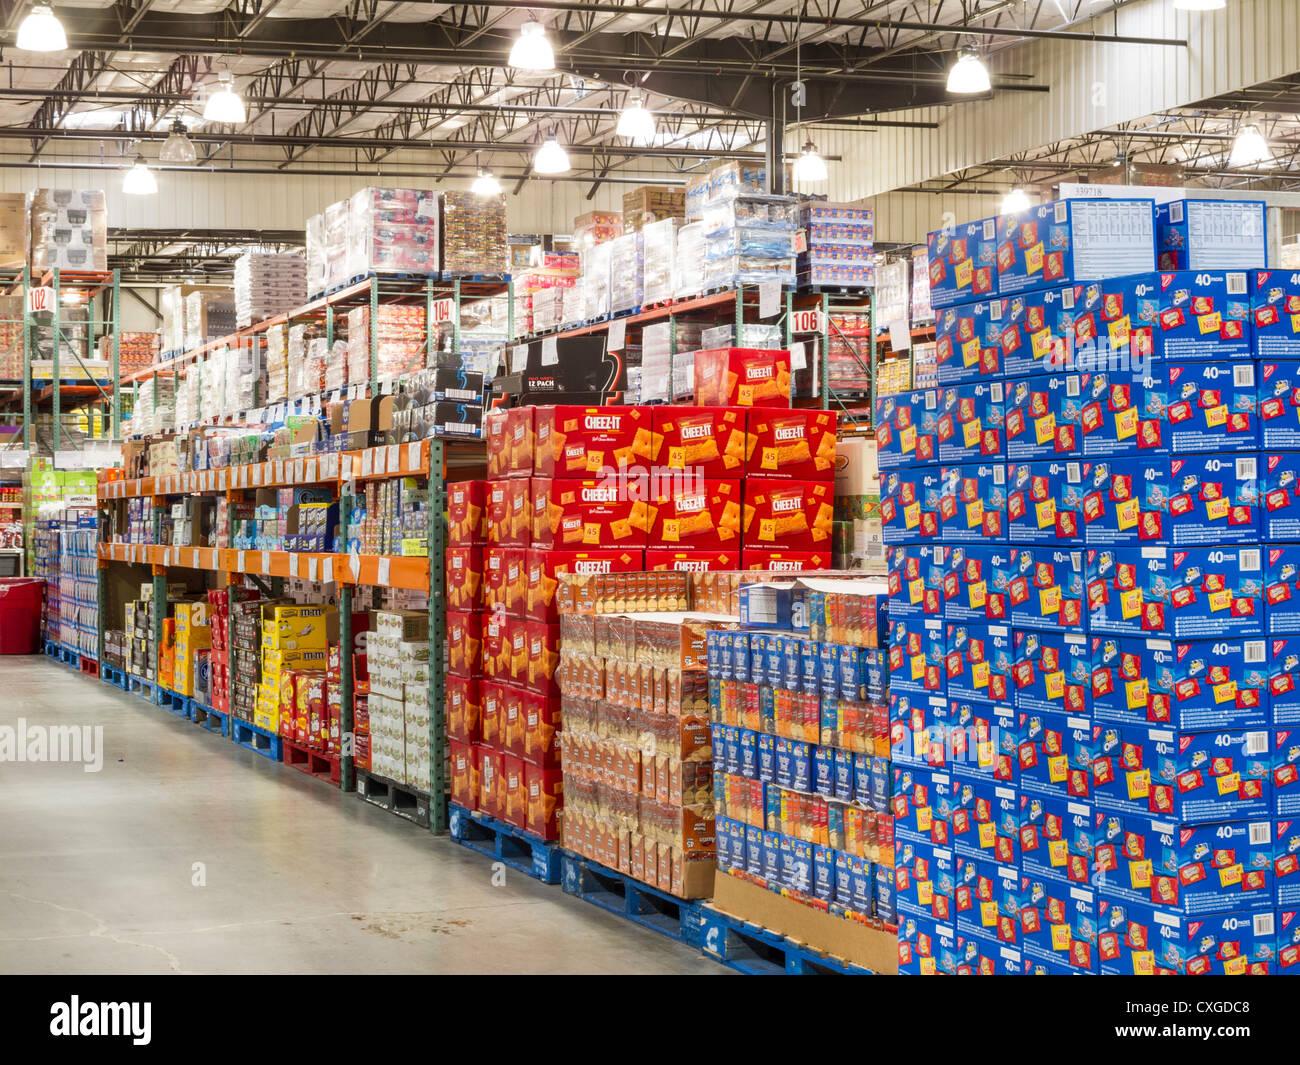 Costco Wholesale Warehouse Store Stock Photo 50763560 Alamy